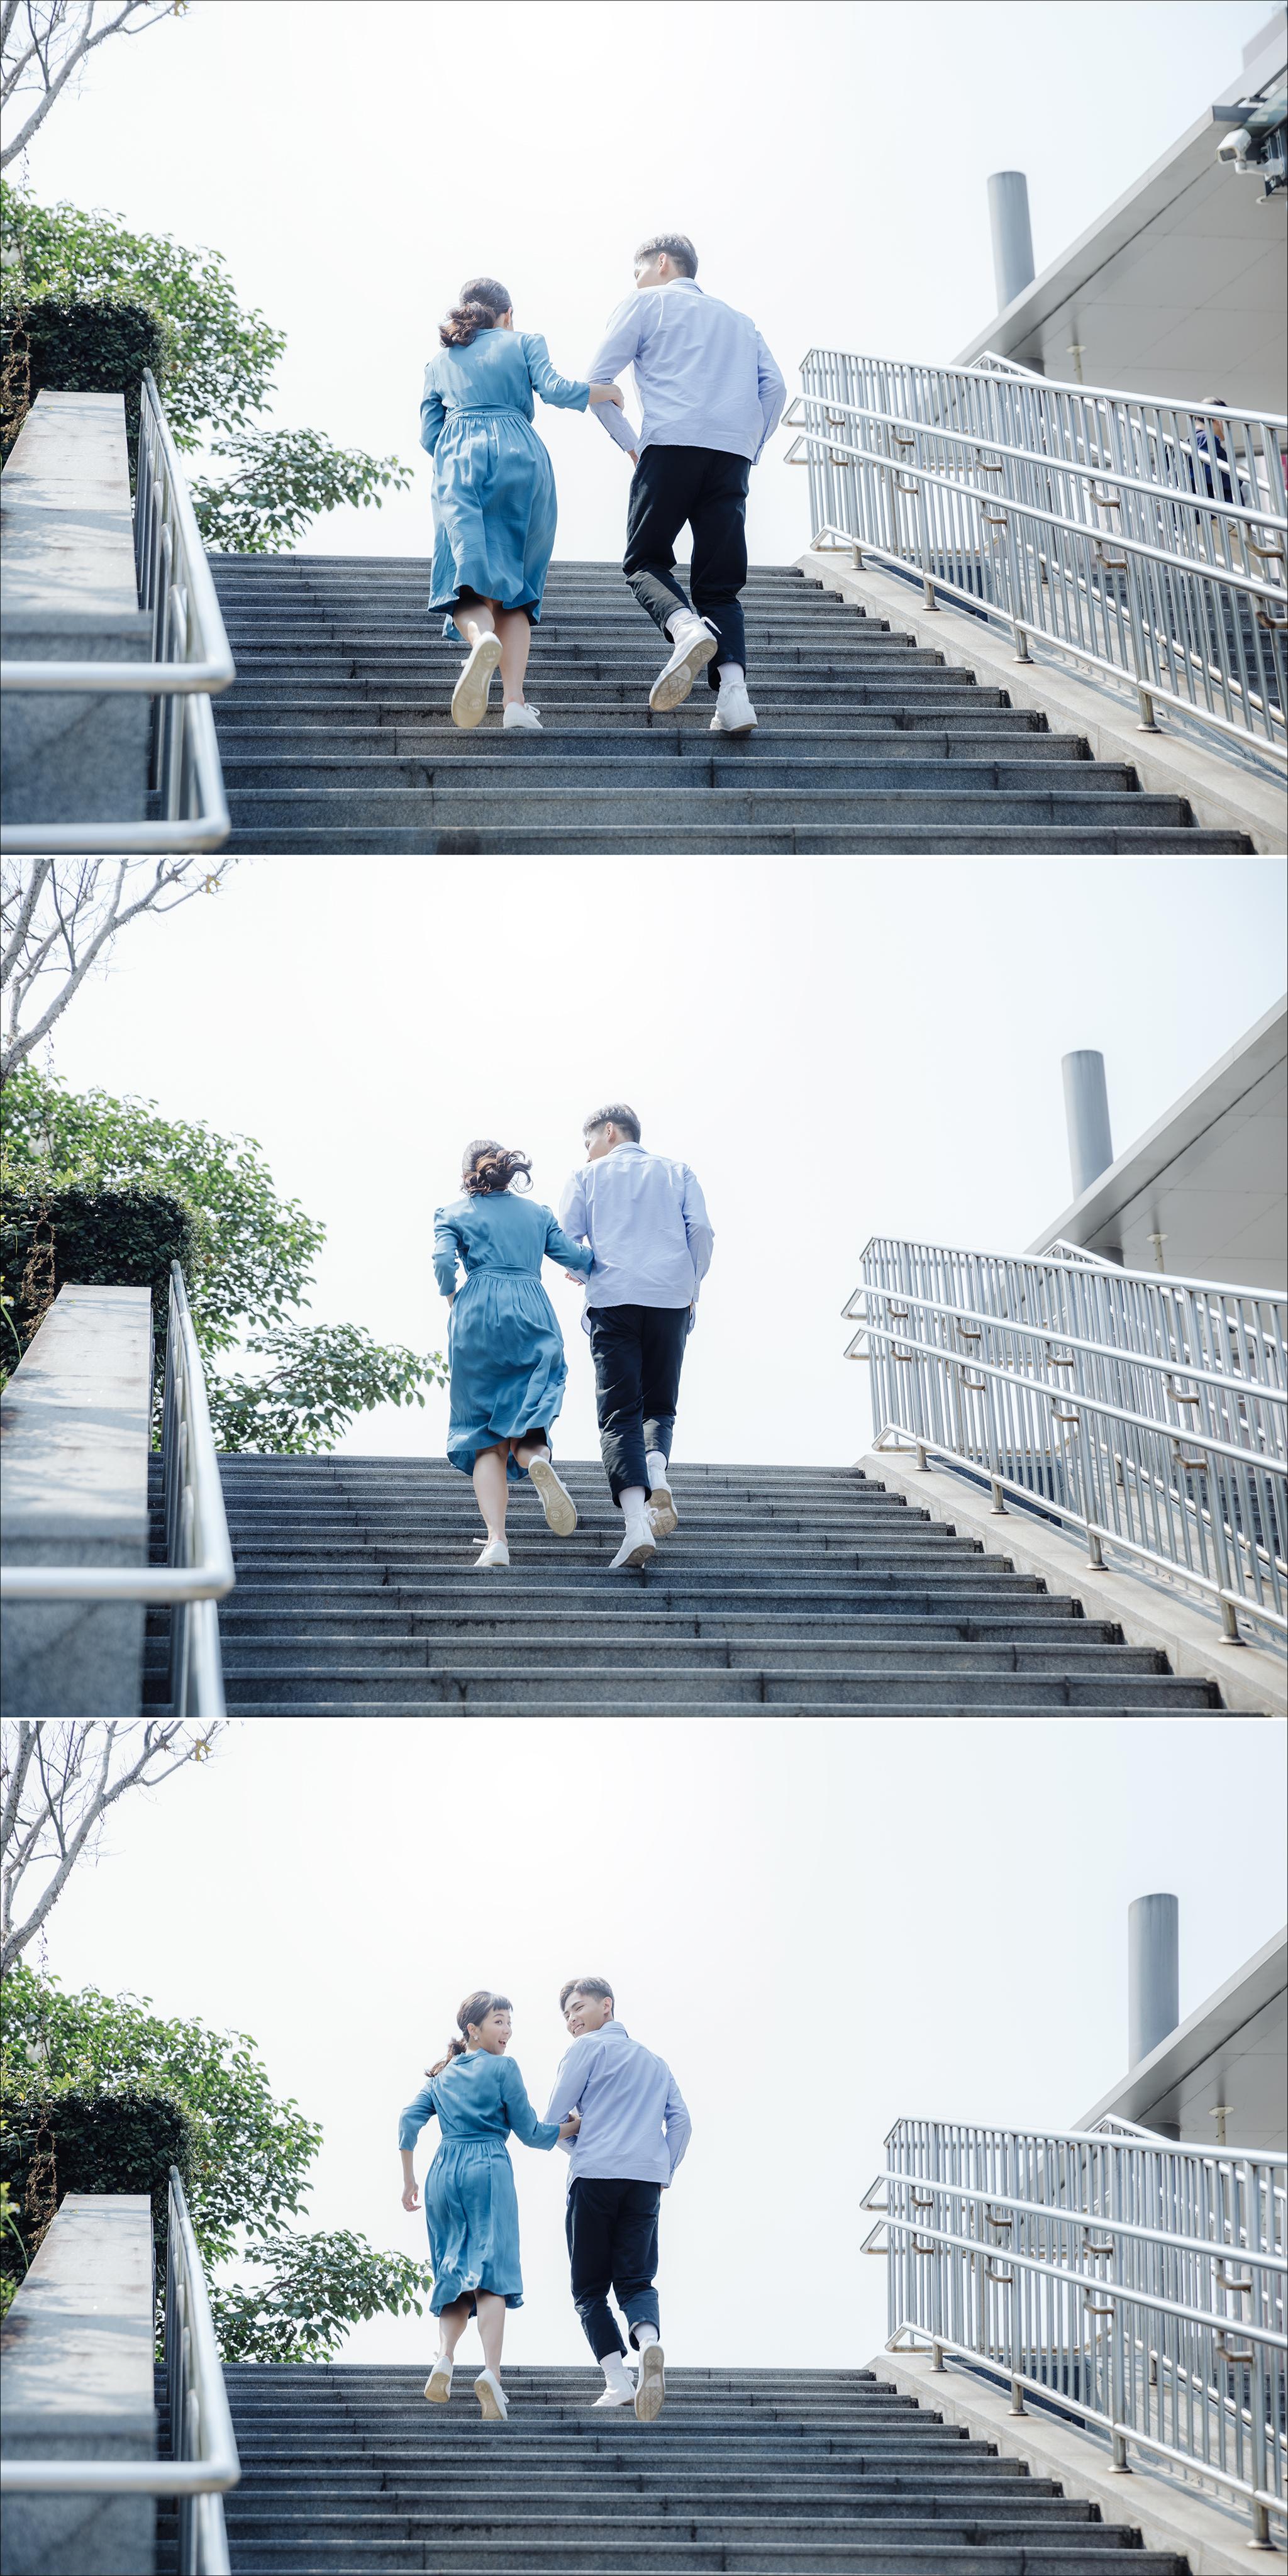 49818351457 a442741819 o - 【自助婚紗】+允宥&珮嘉+